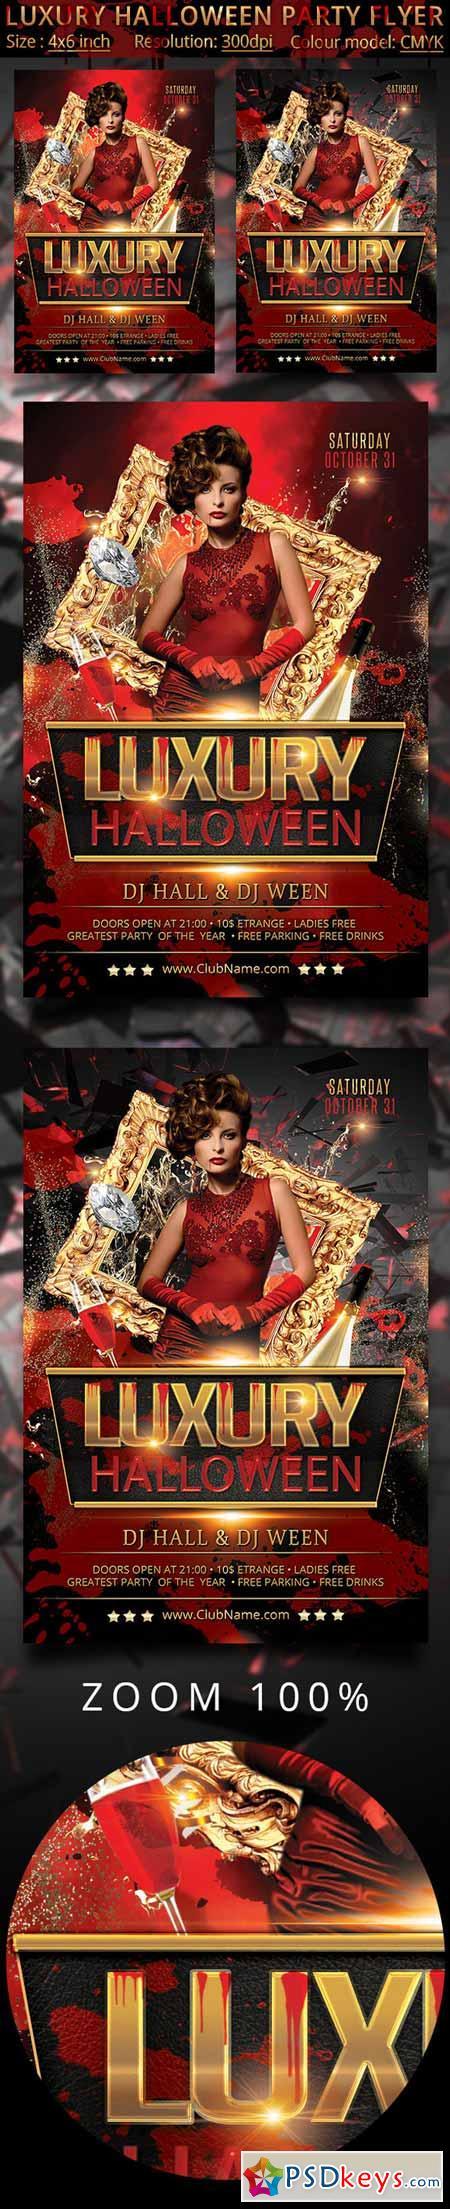 Luxury Halloween Party Flyer 405454